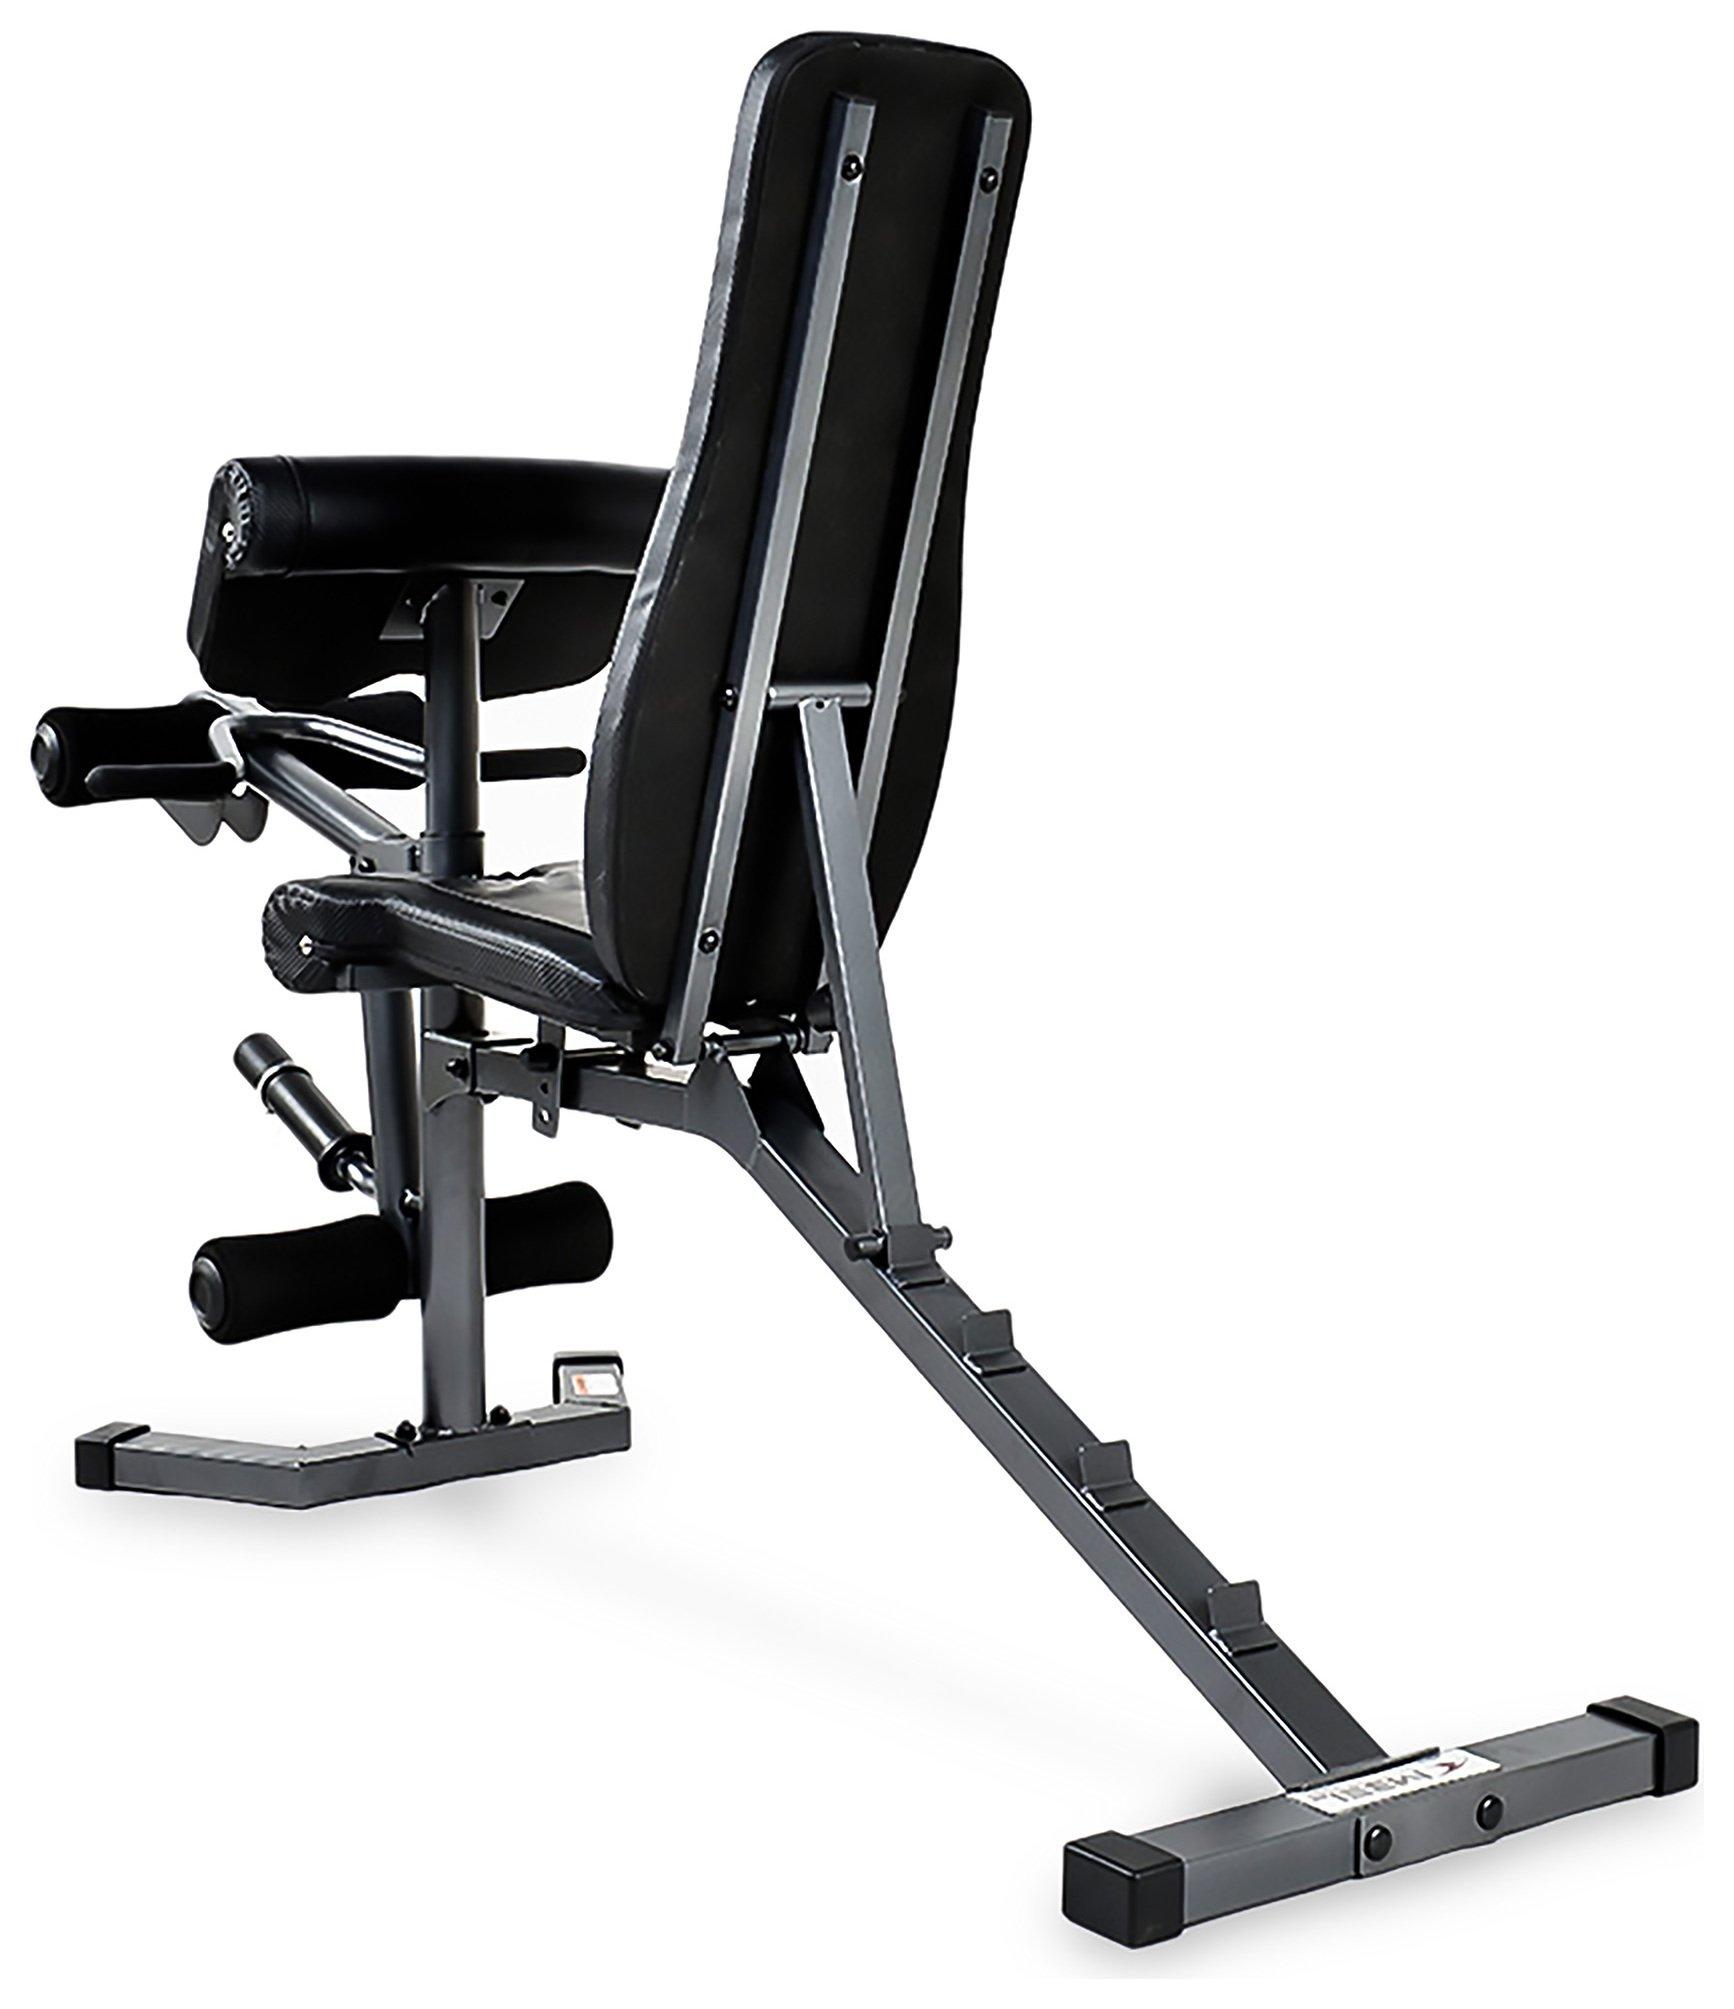 Marcy SM1050 Home Multi Gym Smith Machine. Reviews